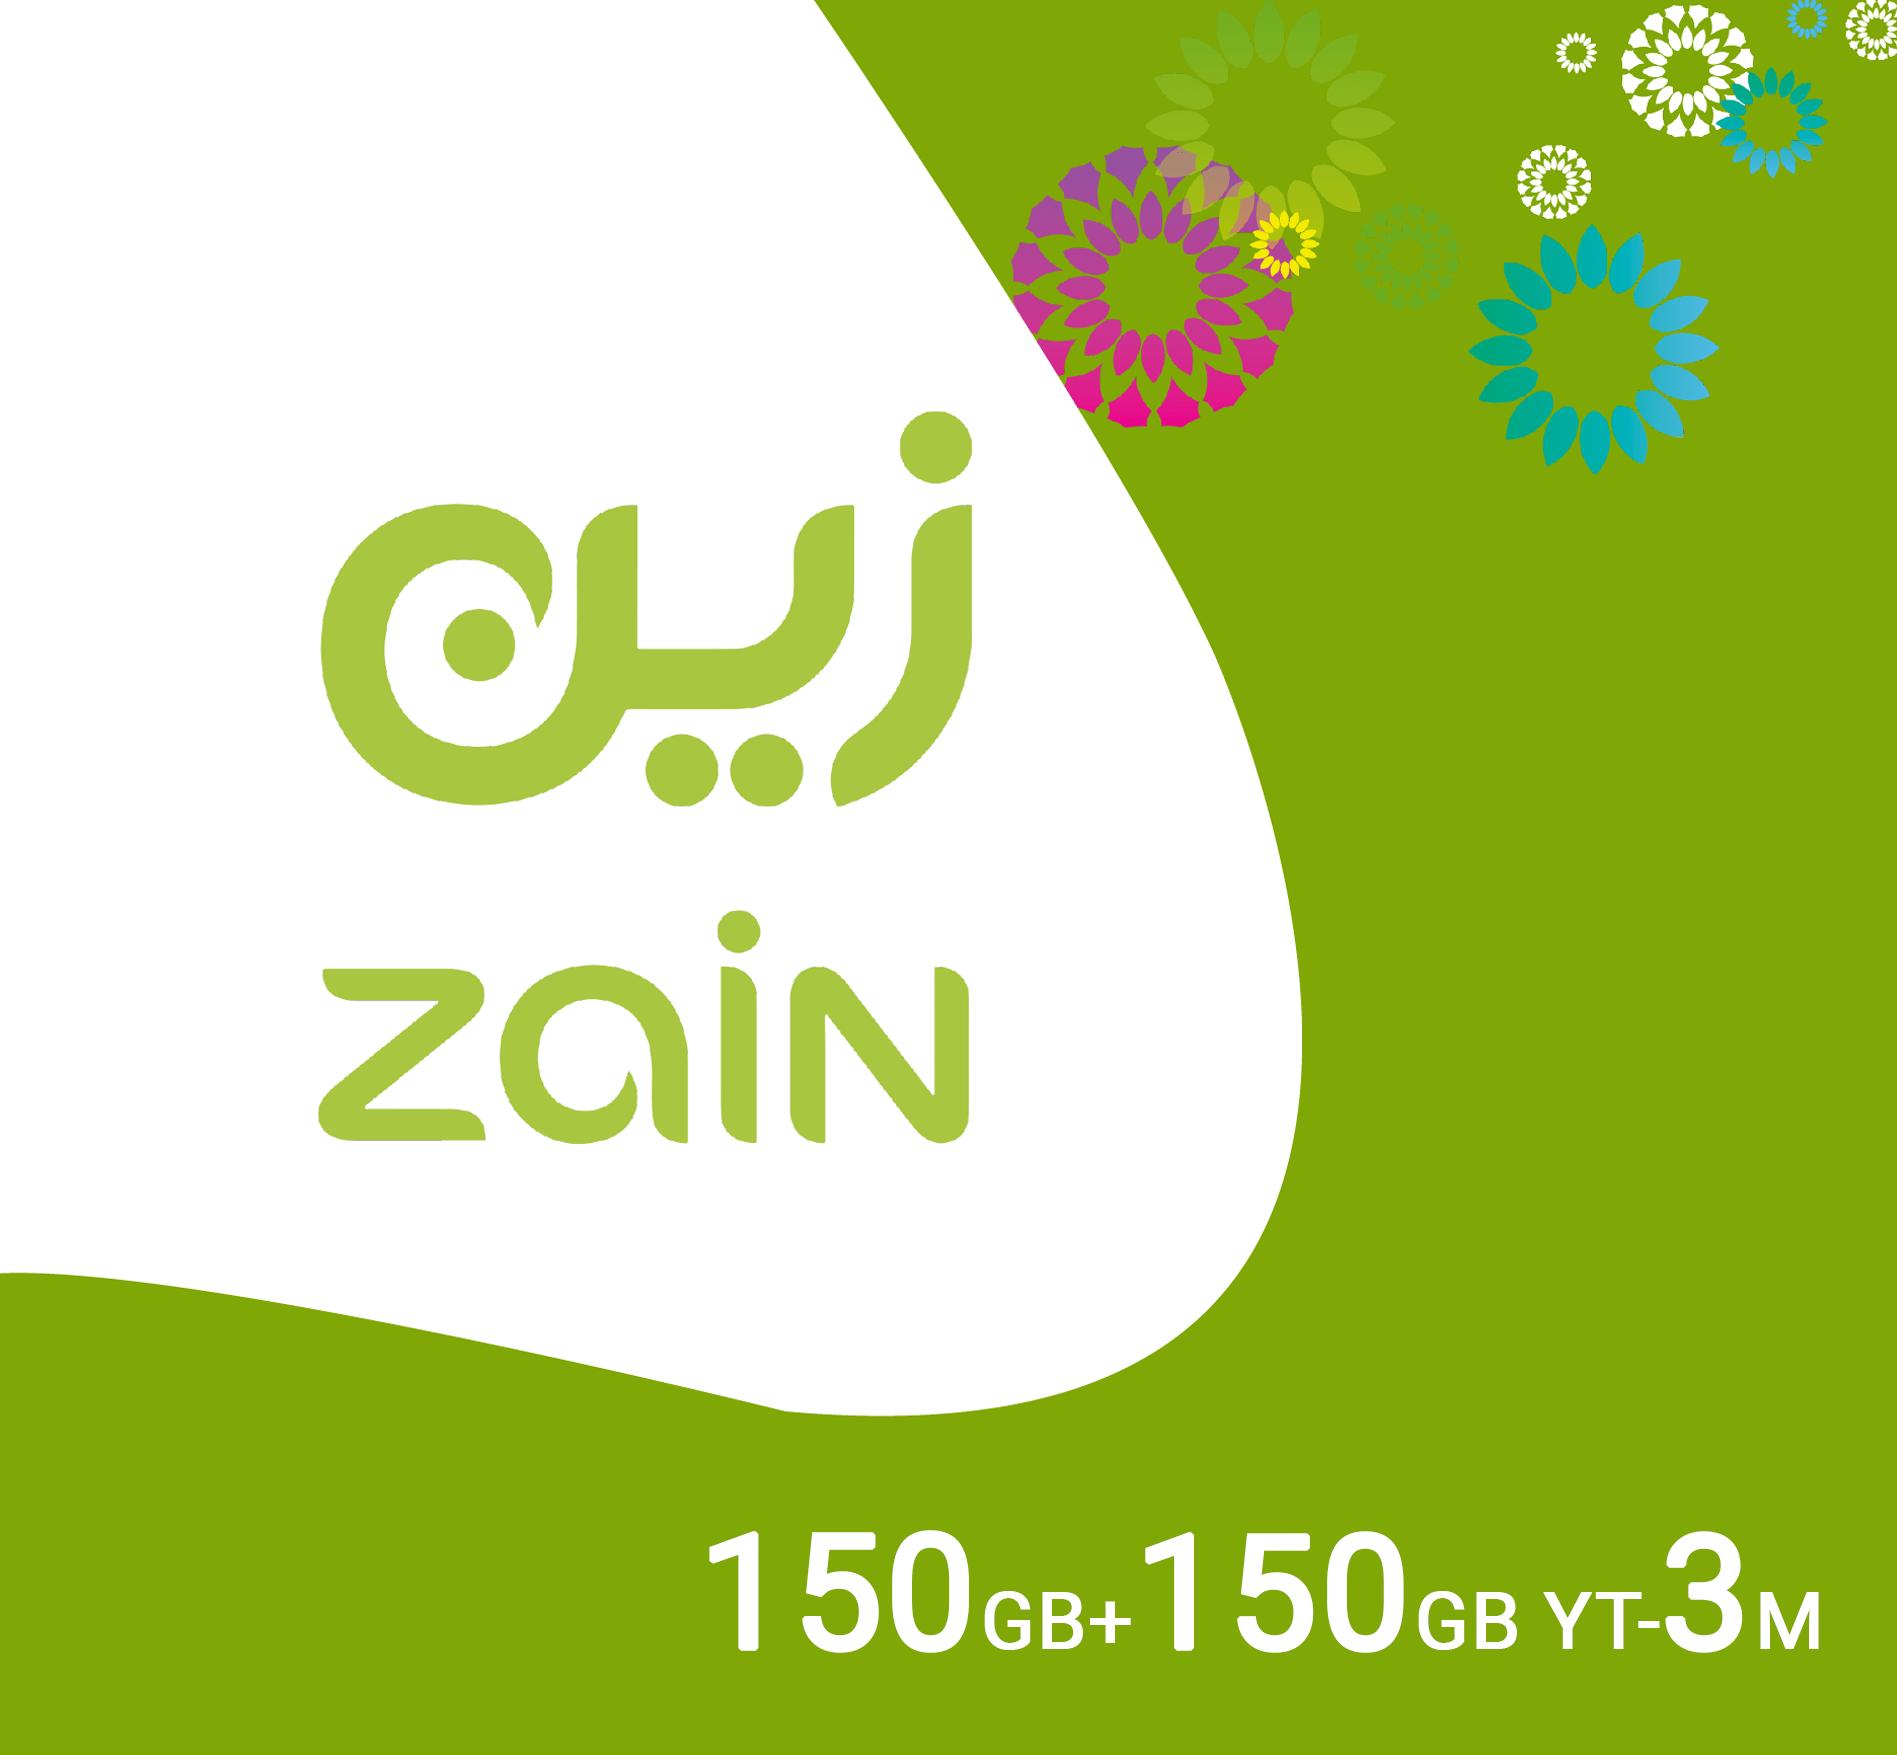 Zain Data Recharge 150GB + 150GB Youtube - 3 Months